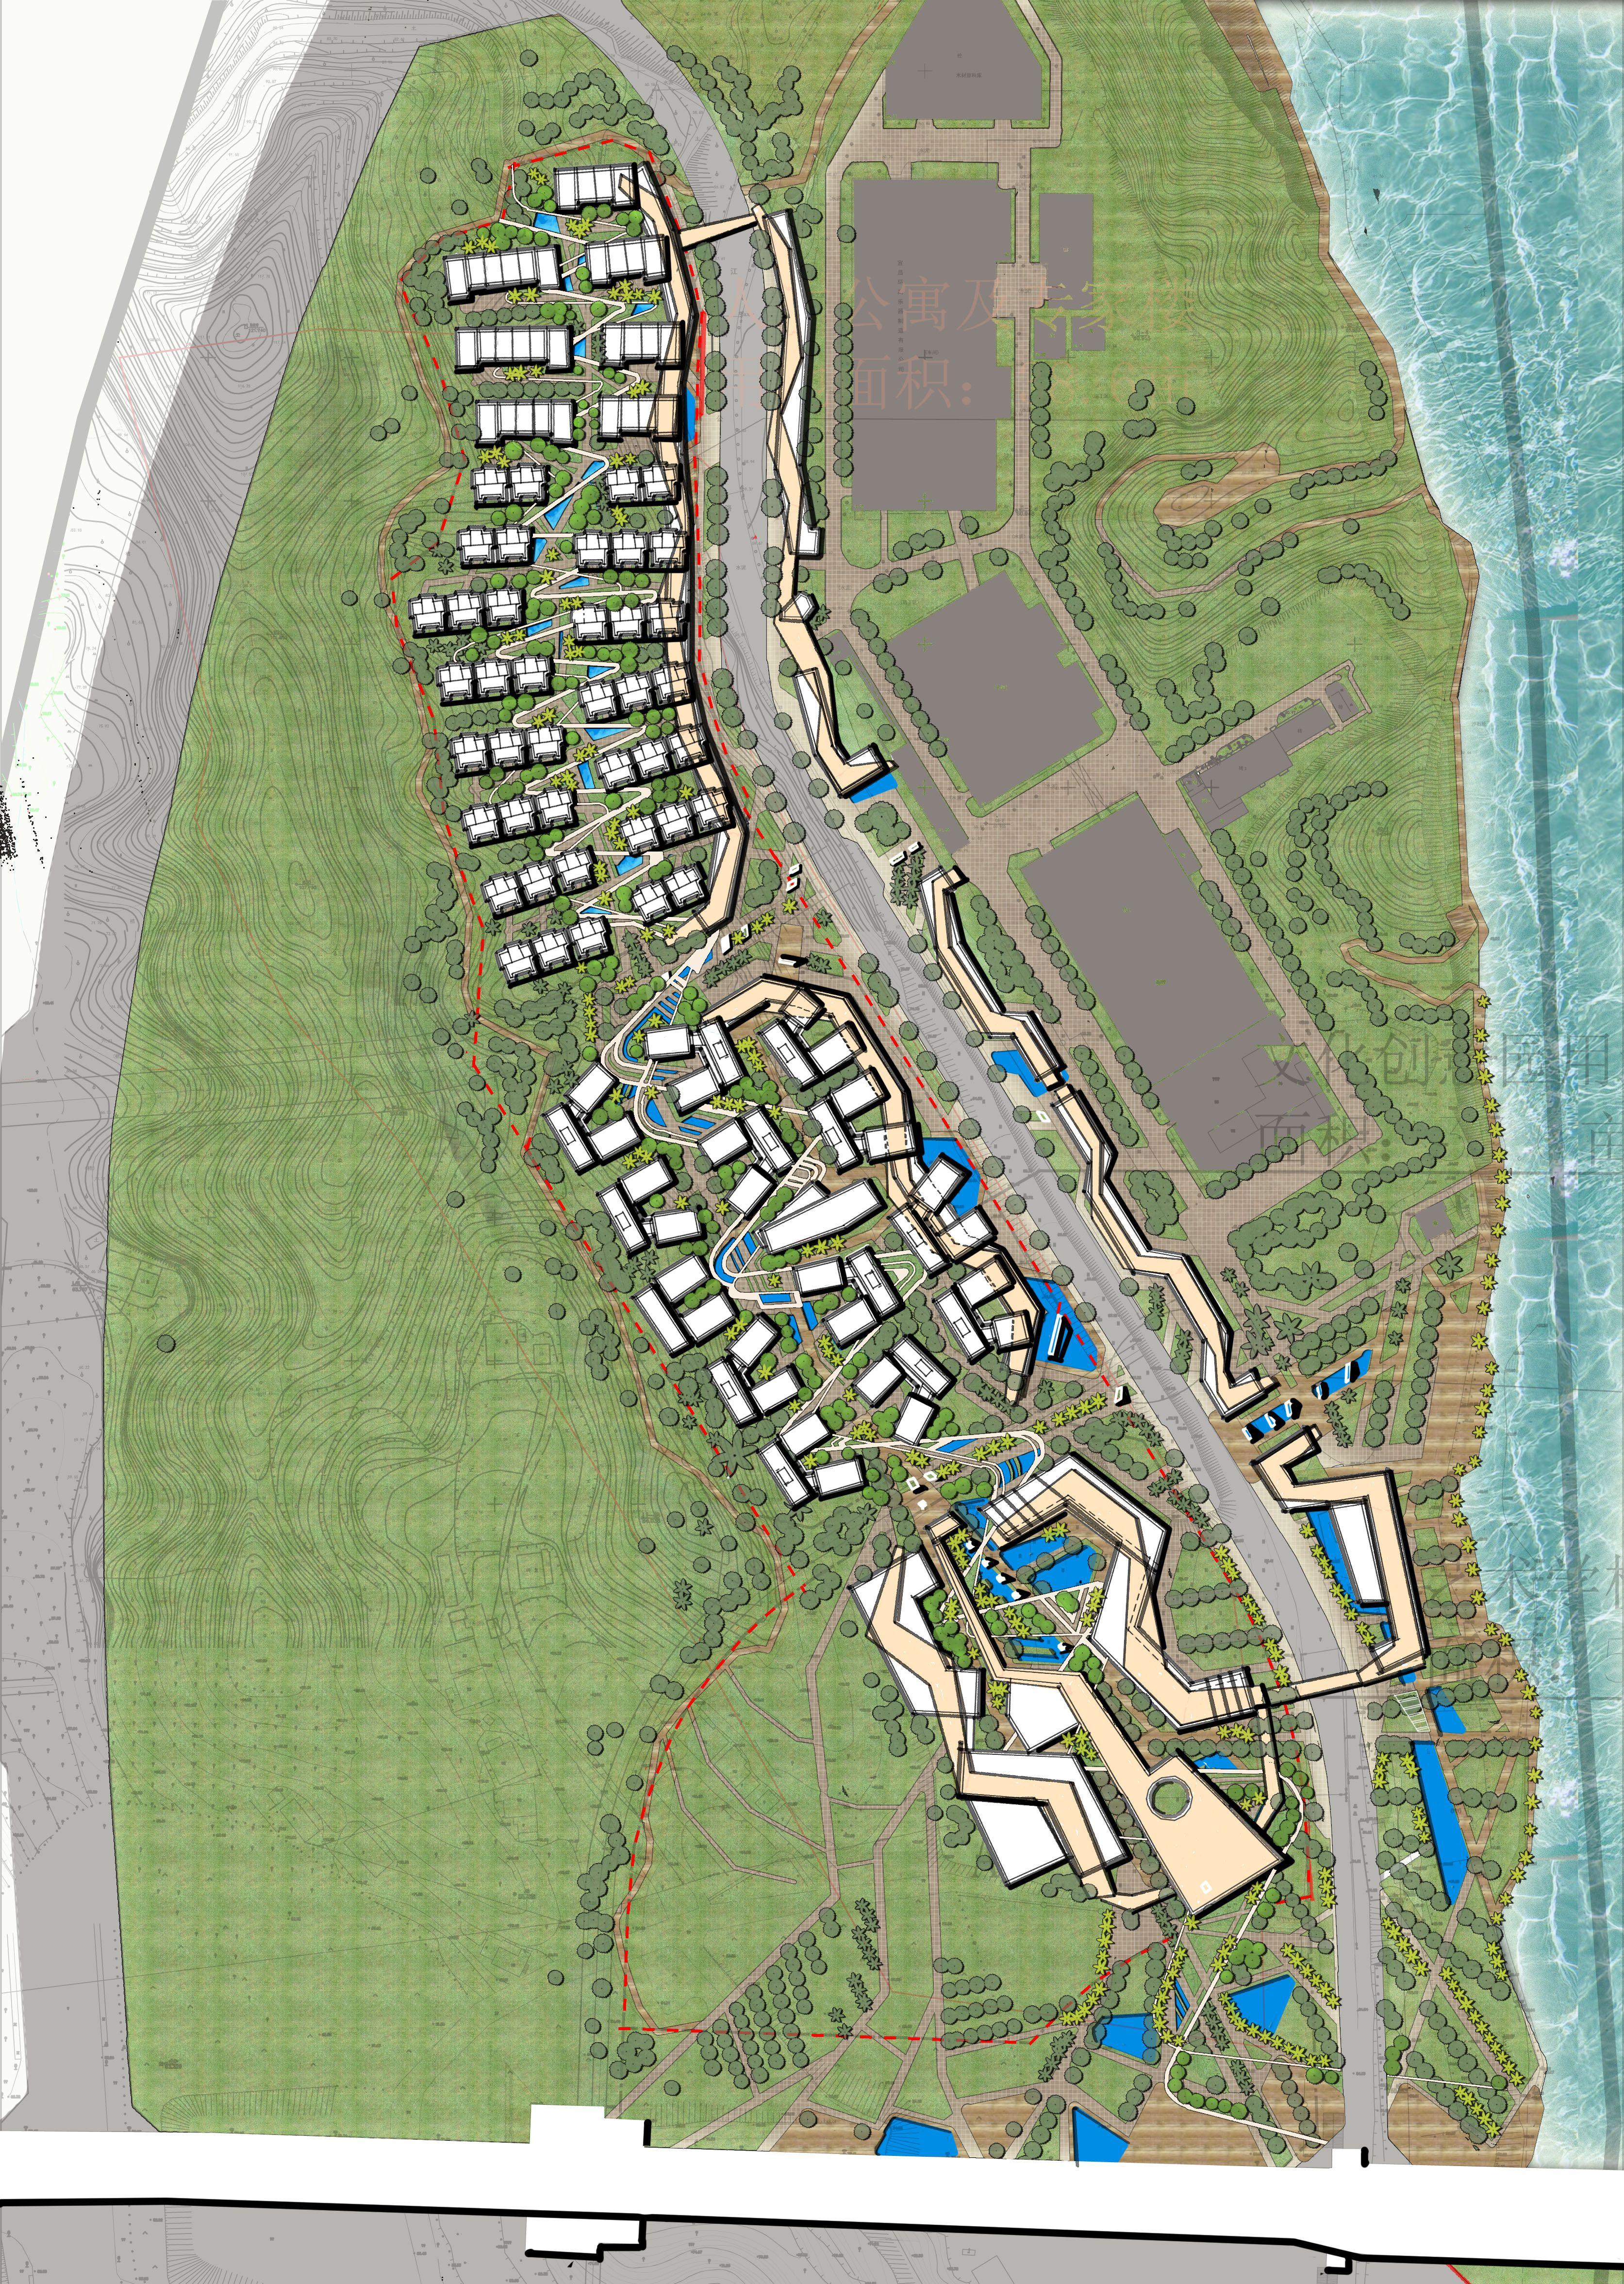 Landscape design, Masterplan, MixedUse Development